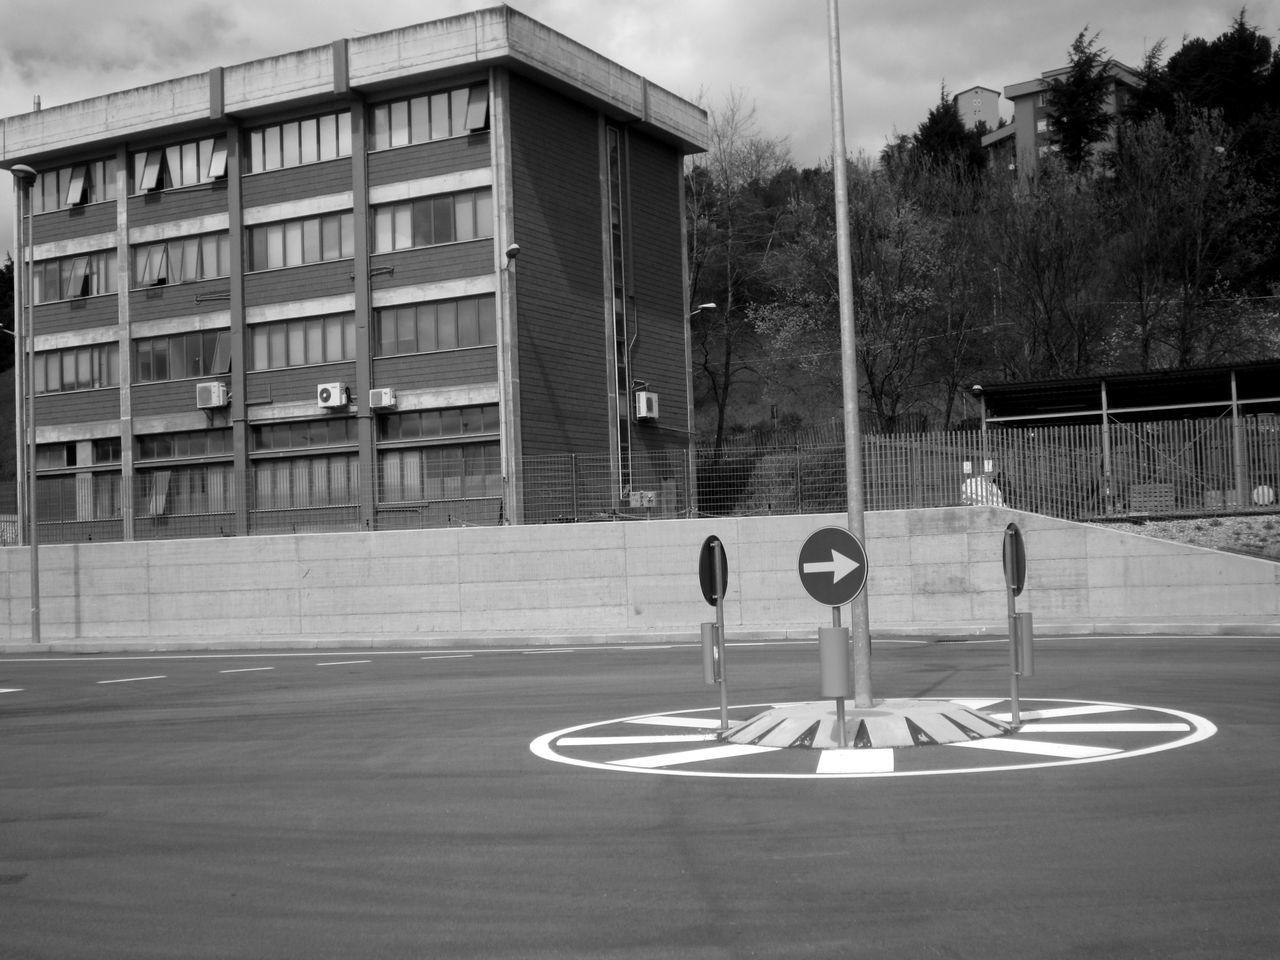 #basilicata #Black&White #blackandwhite #fotobiancoenero #fotobianconero #gallitello #lucania #OldPicture #potenza #potenzainferiore #urban #urbanphotography